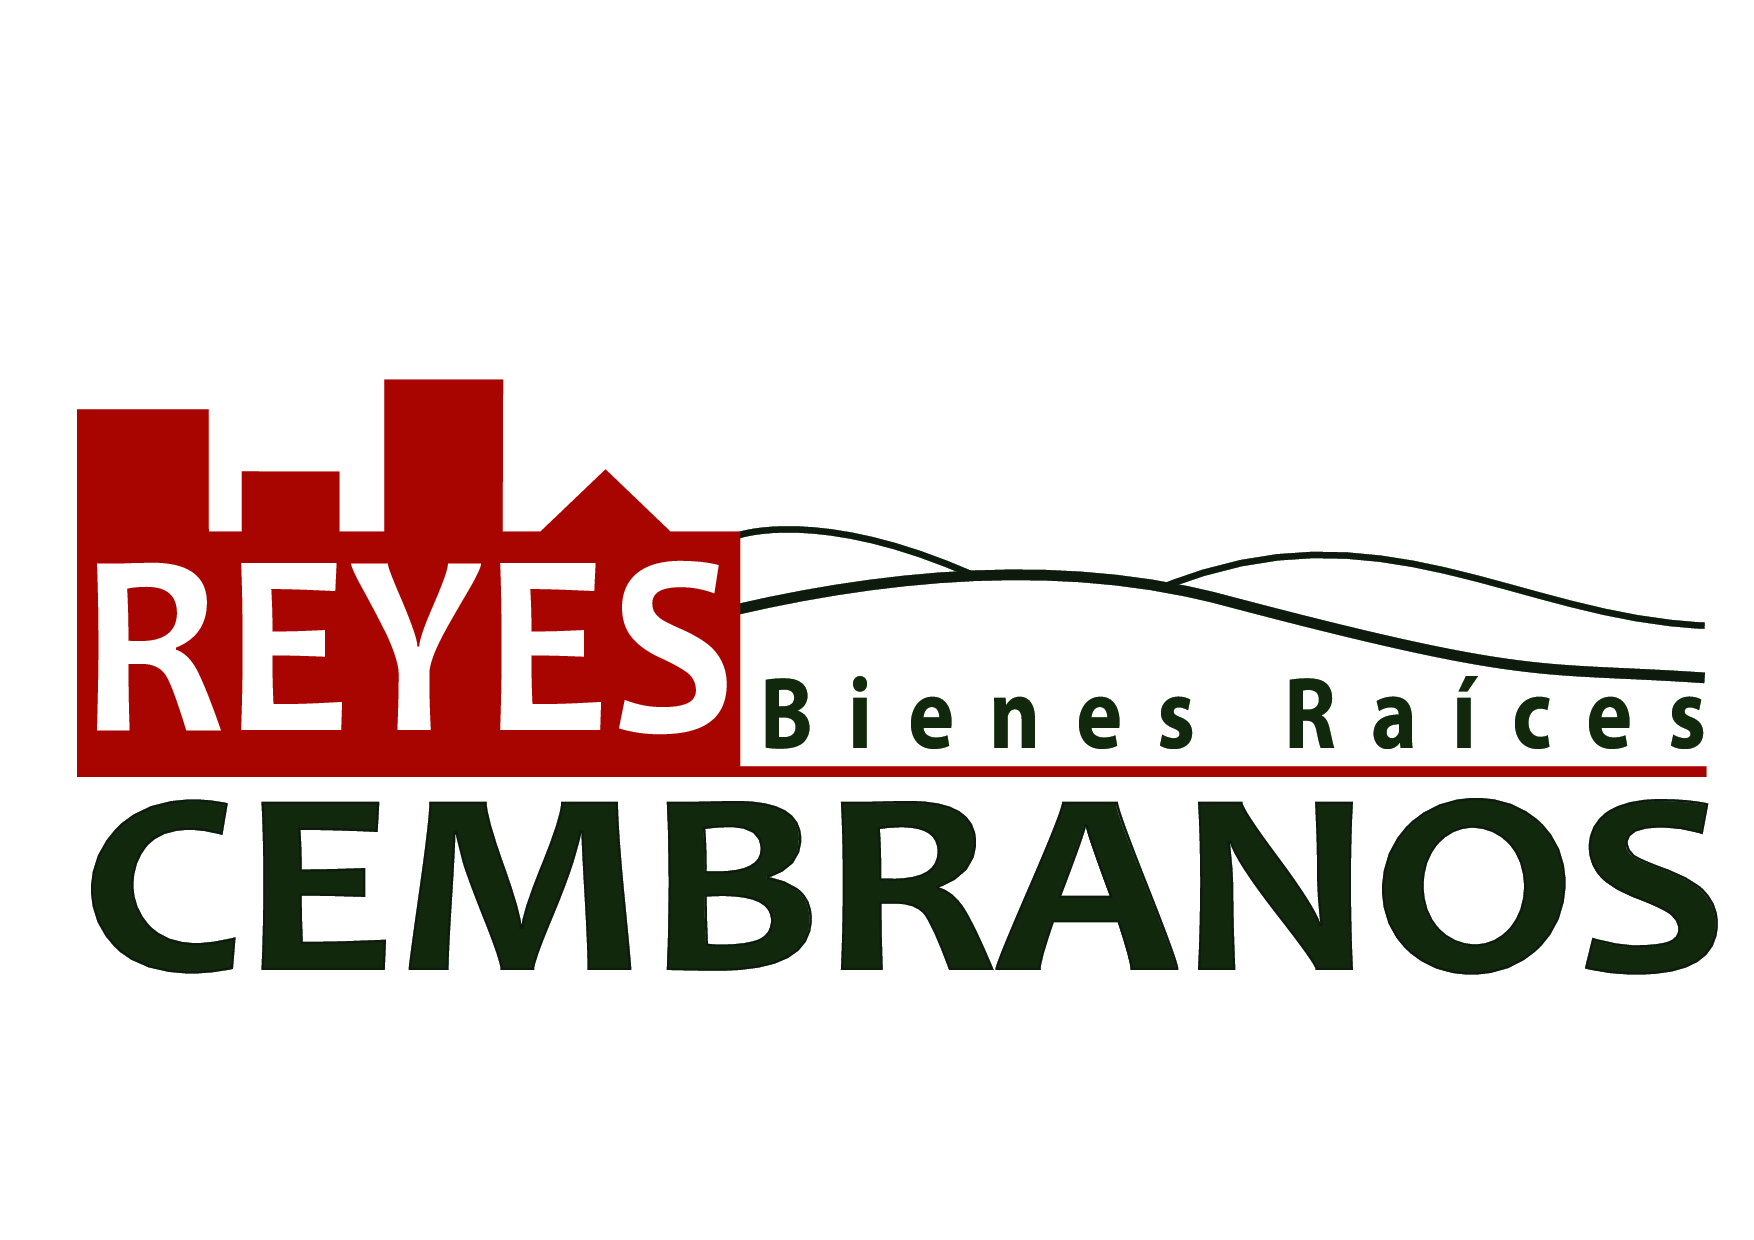 Reyes Cembranos